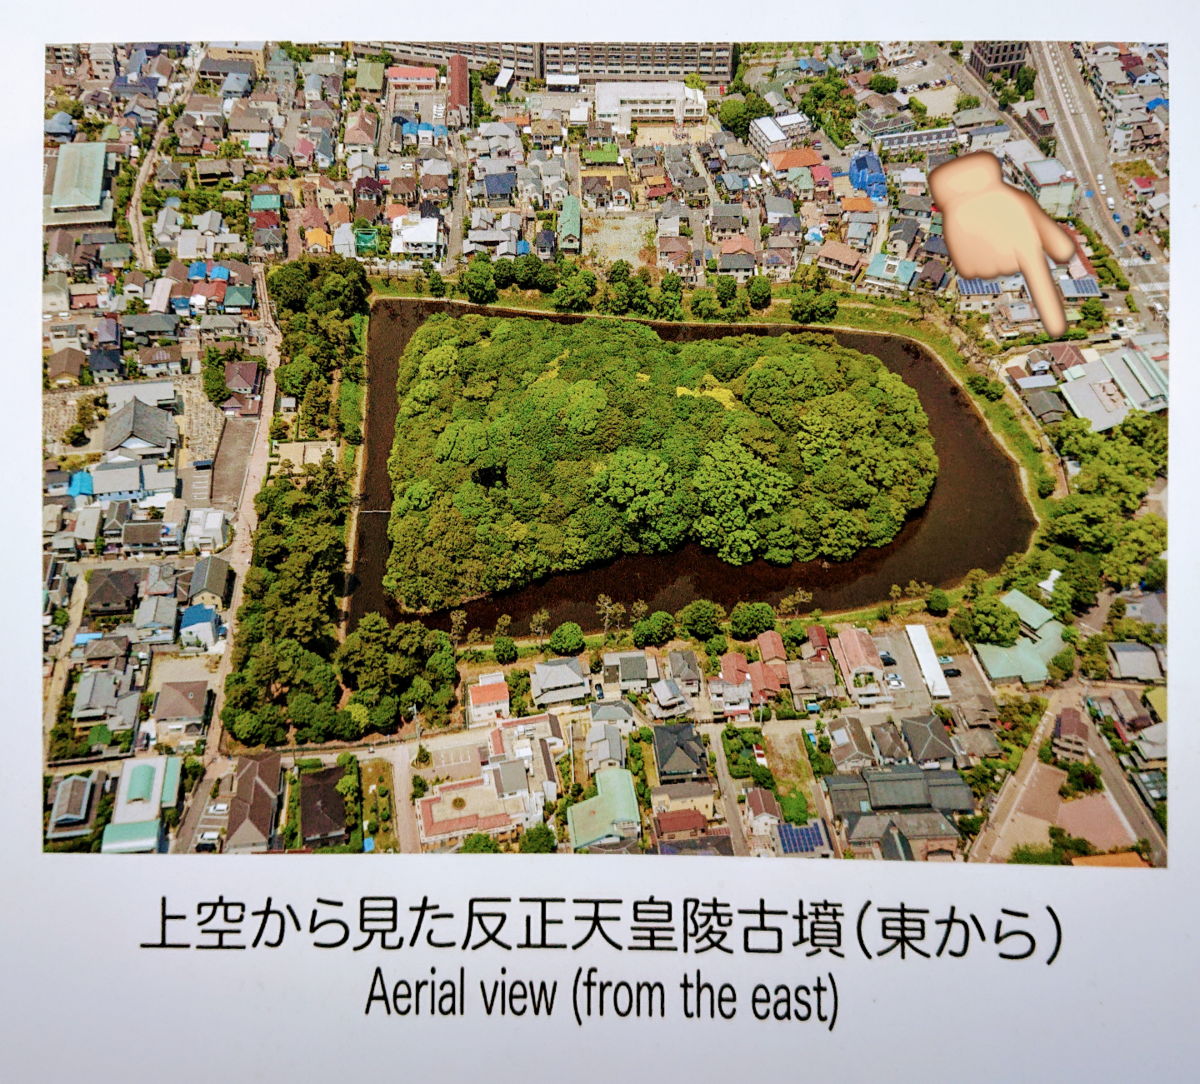 f:id:Kaimotu_Hatuji:20200105190848p:plain